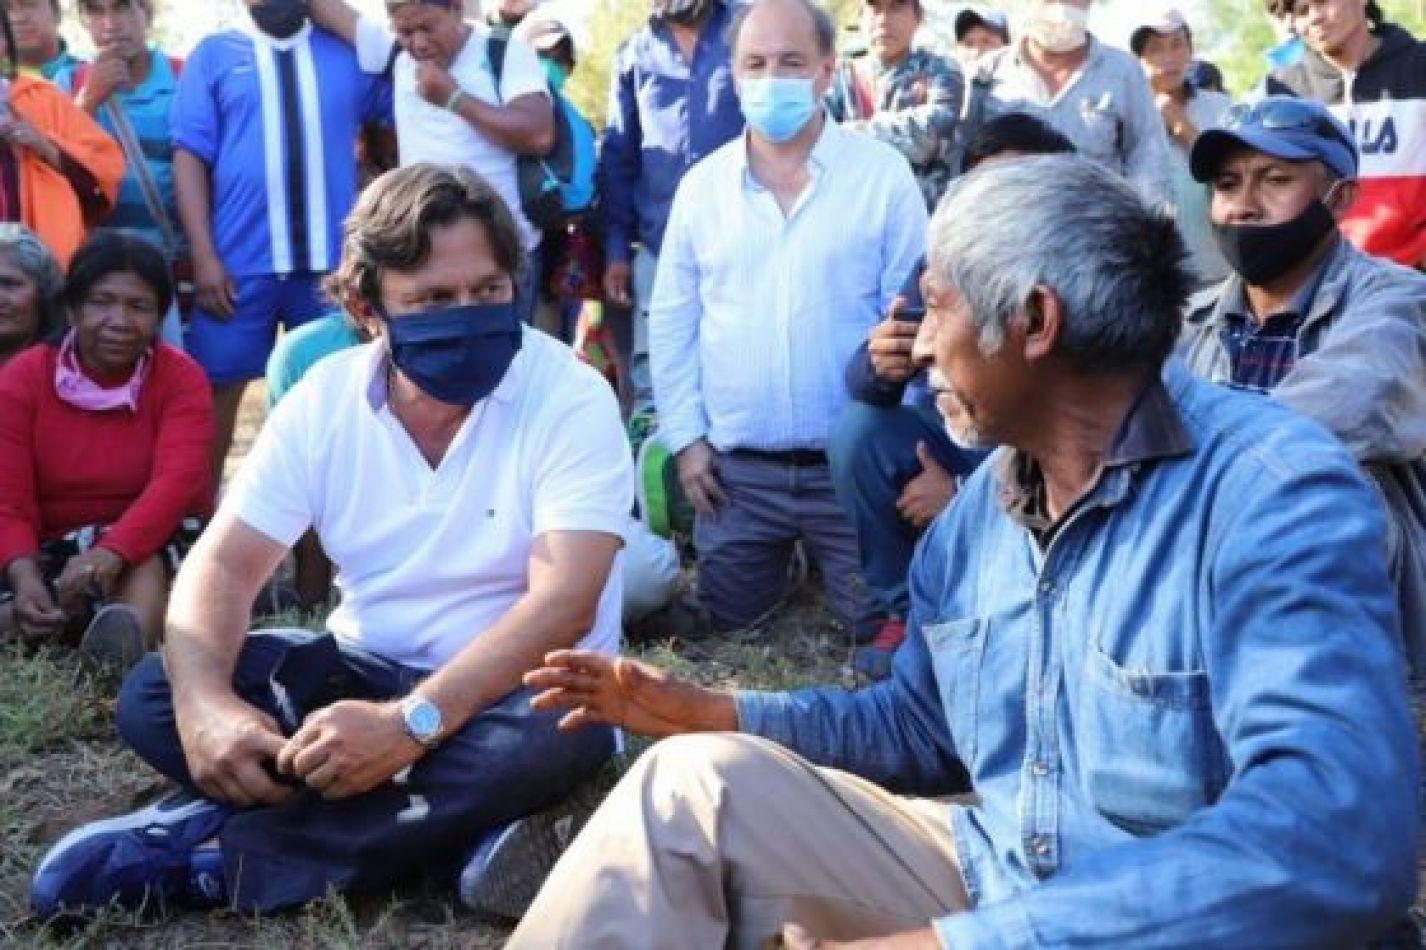 Sáenz encabezó un encuentro de diálogo y consenso con comunidades originarias